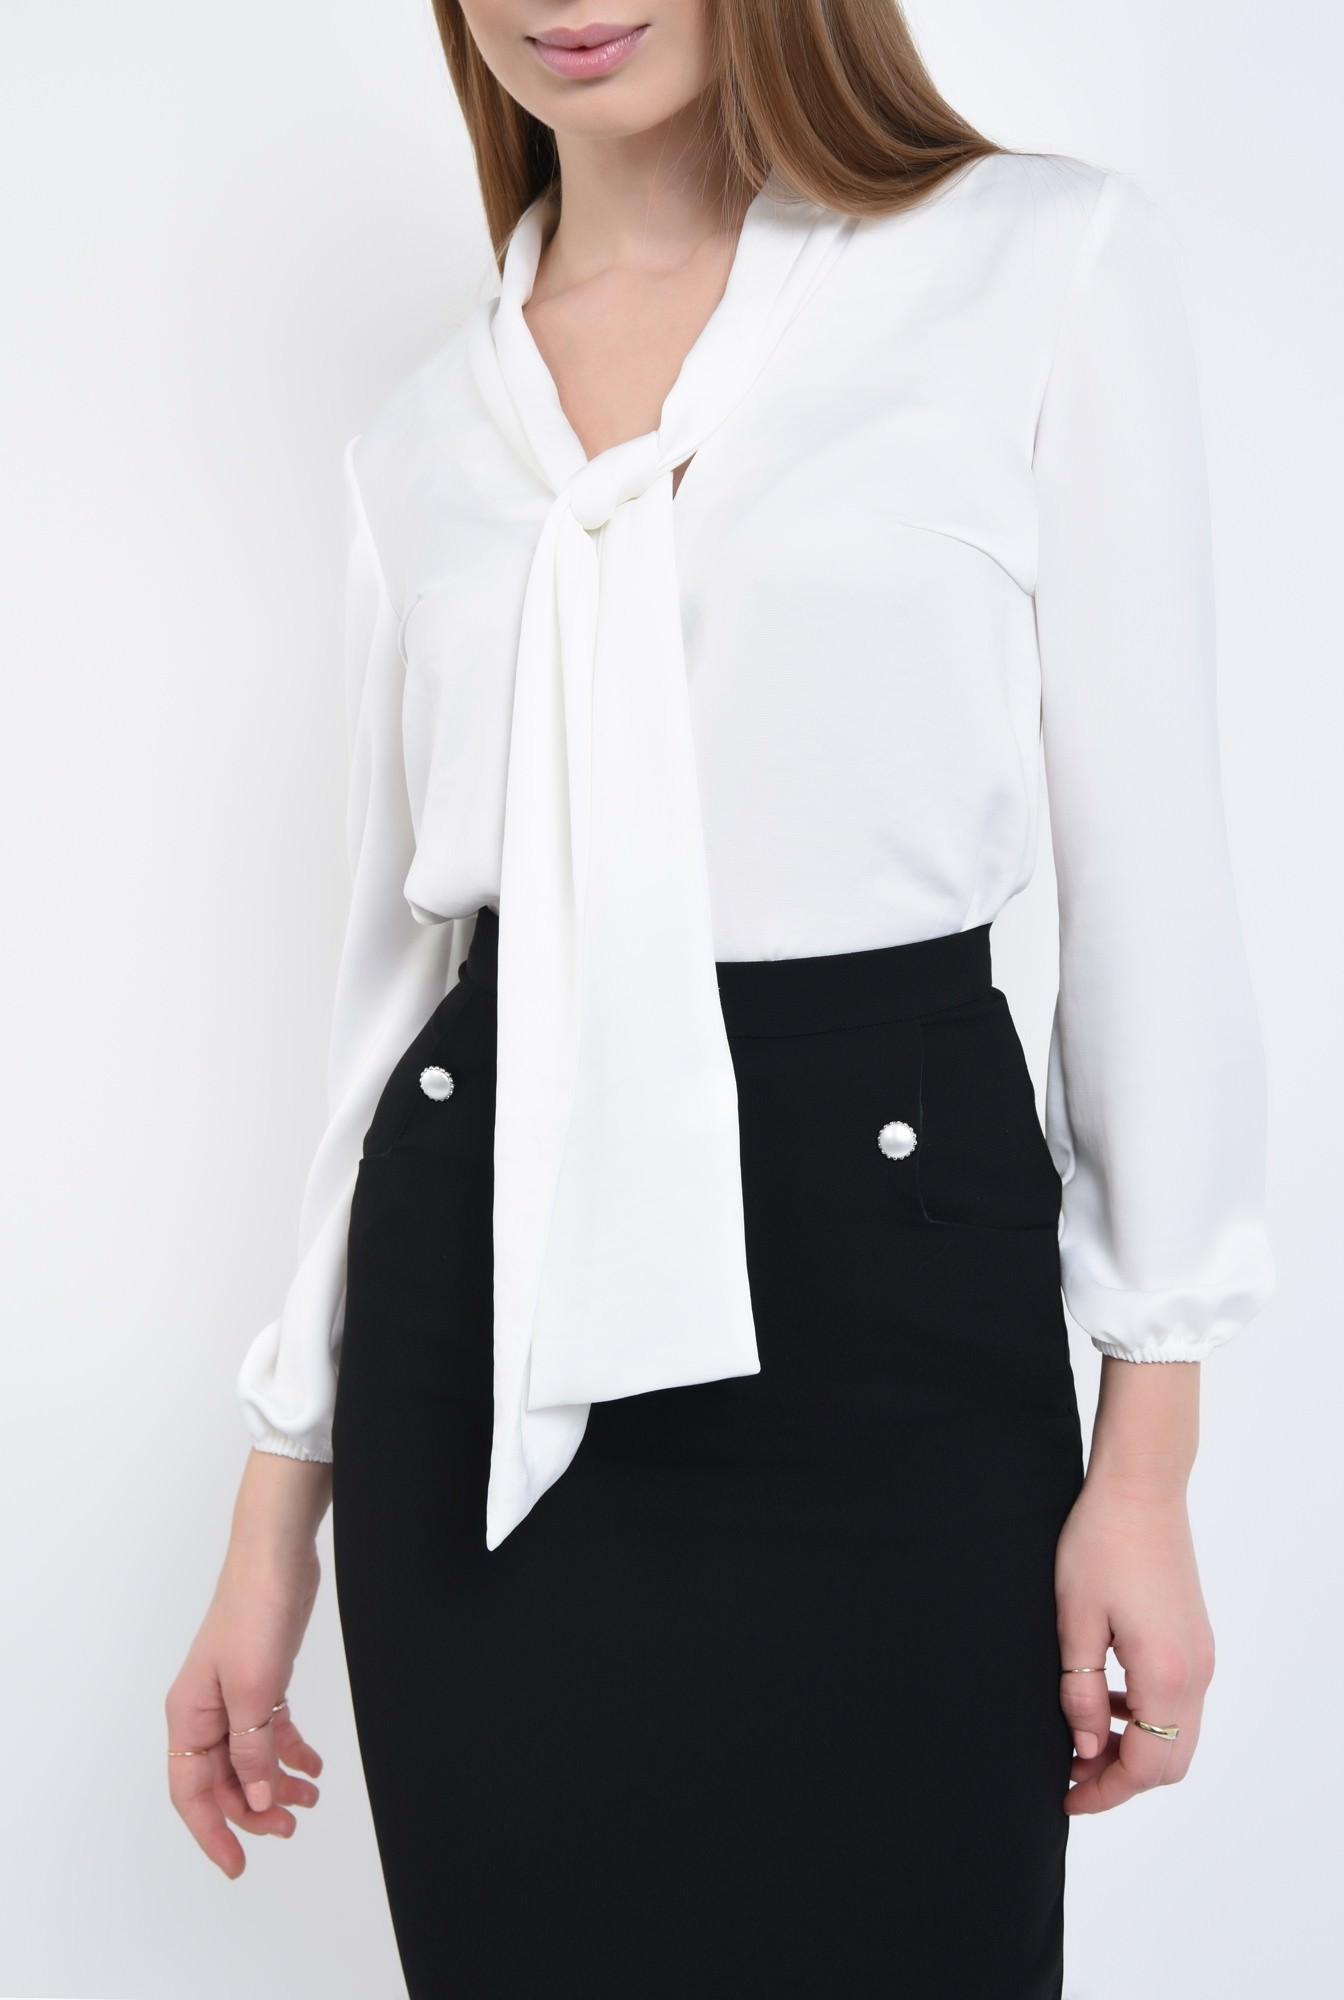 2 - Bluza office, alb, maneci lungi